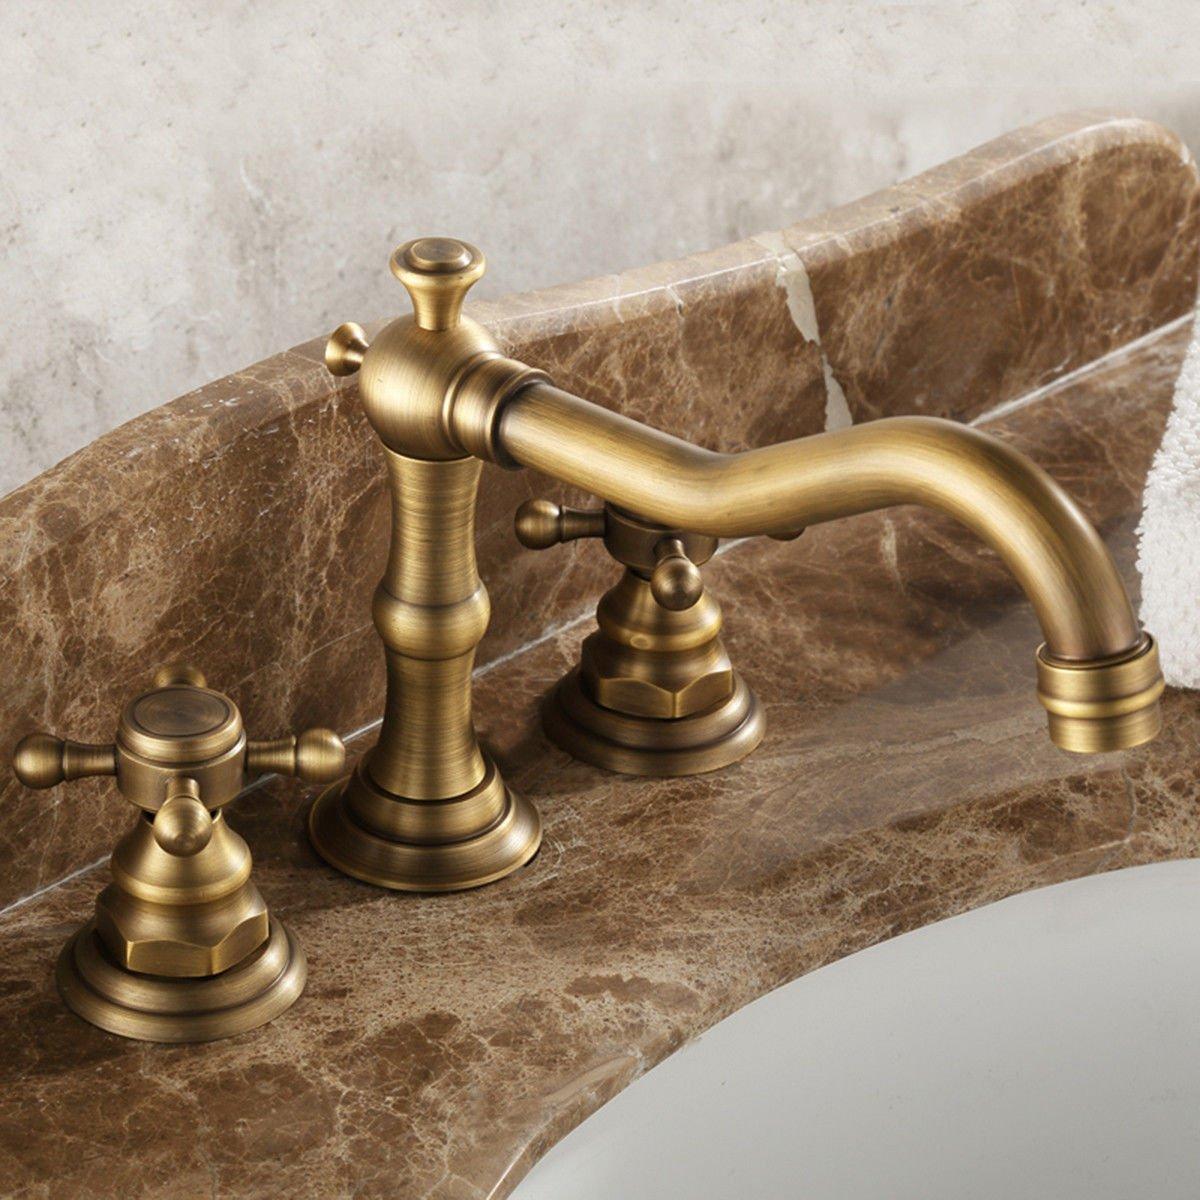 A Hlluya Professional Sink Mixer Tap Kitchen Faucet The tap black Washbasin Faucet antique basin faucet antique brass bathroom hot and cold 3 holes basin bath taps,